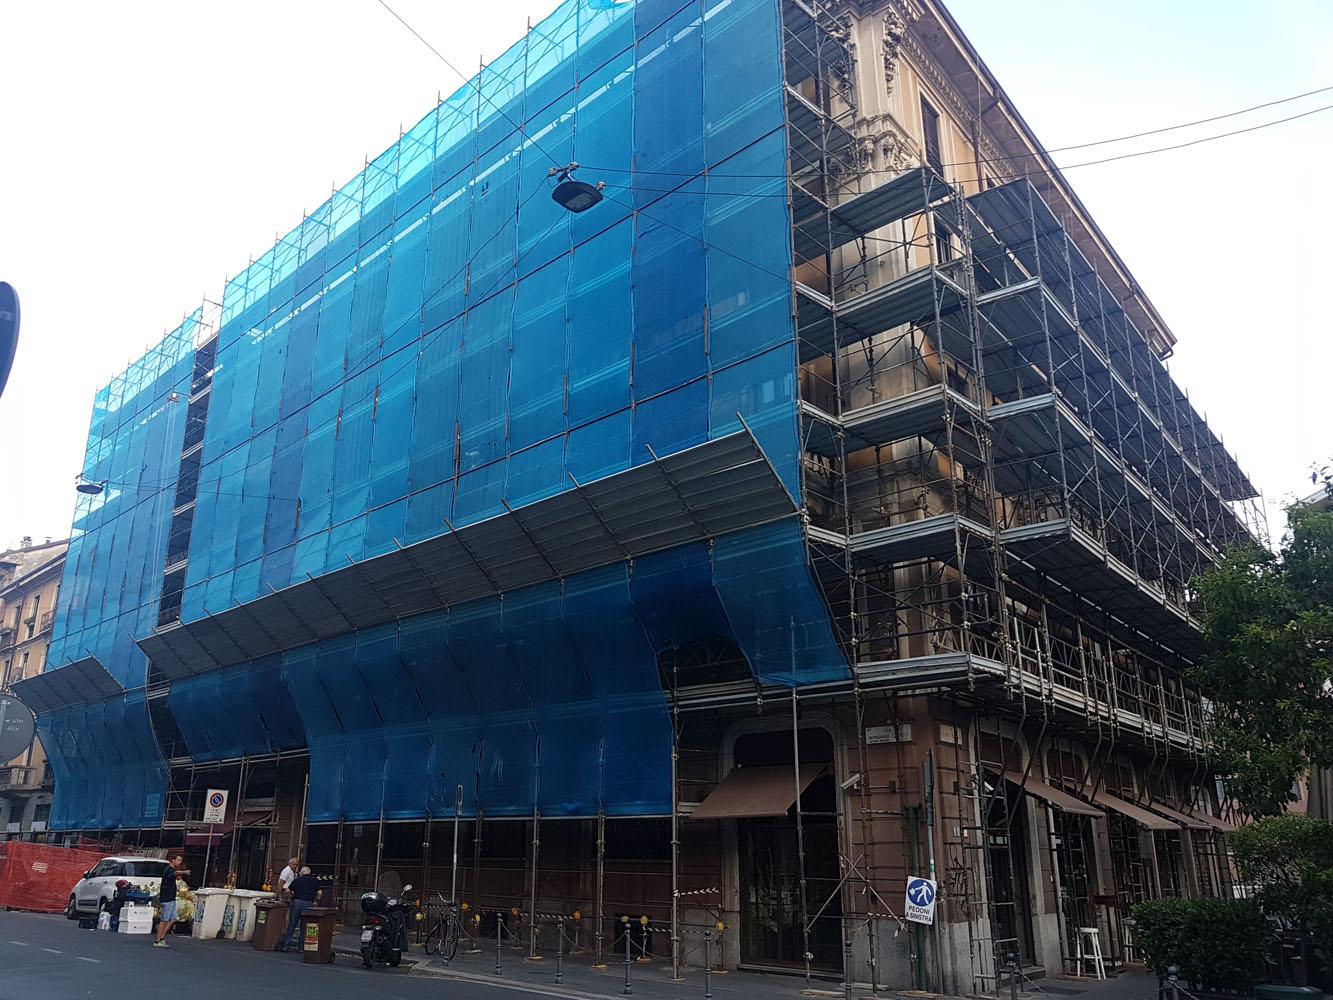 VIA CORIO 3 - Milano